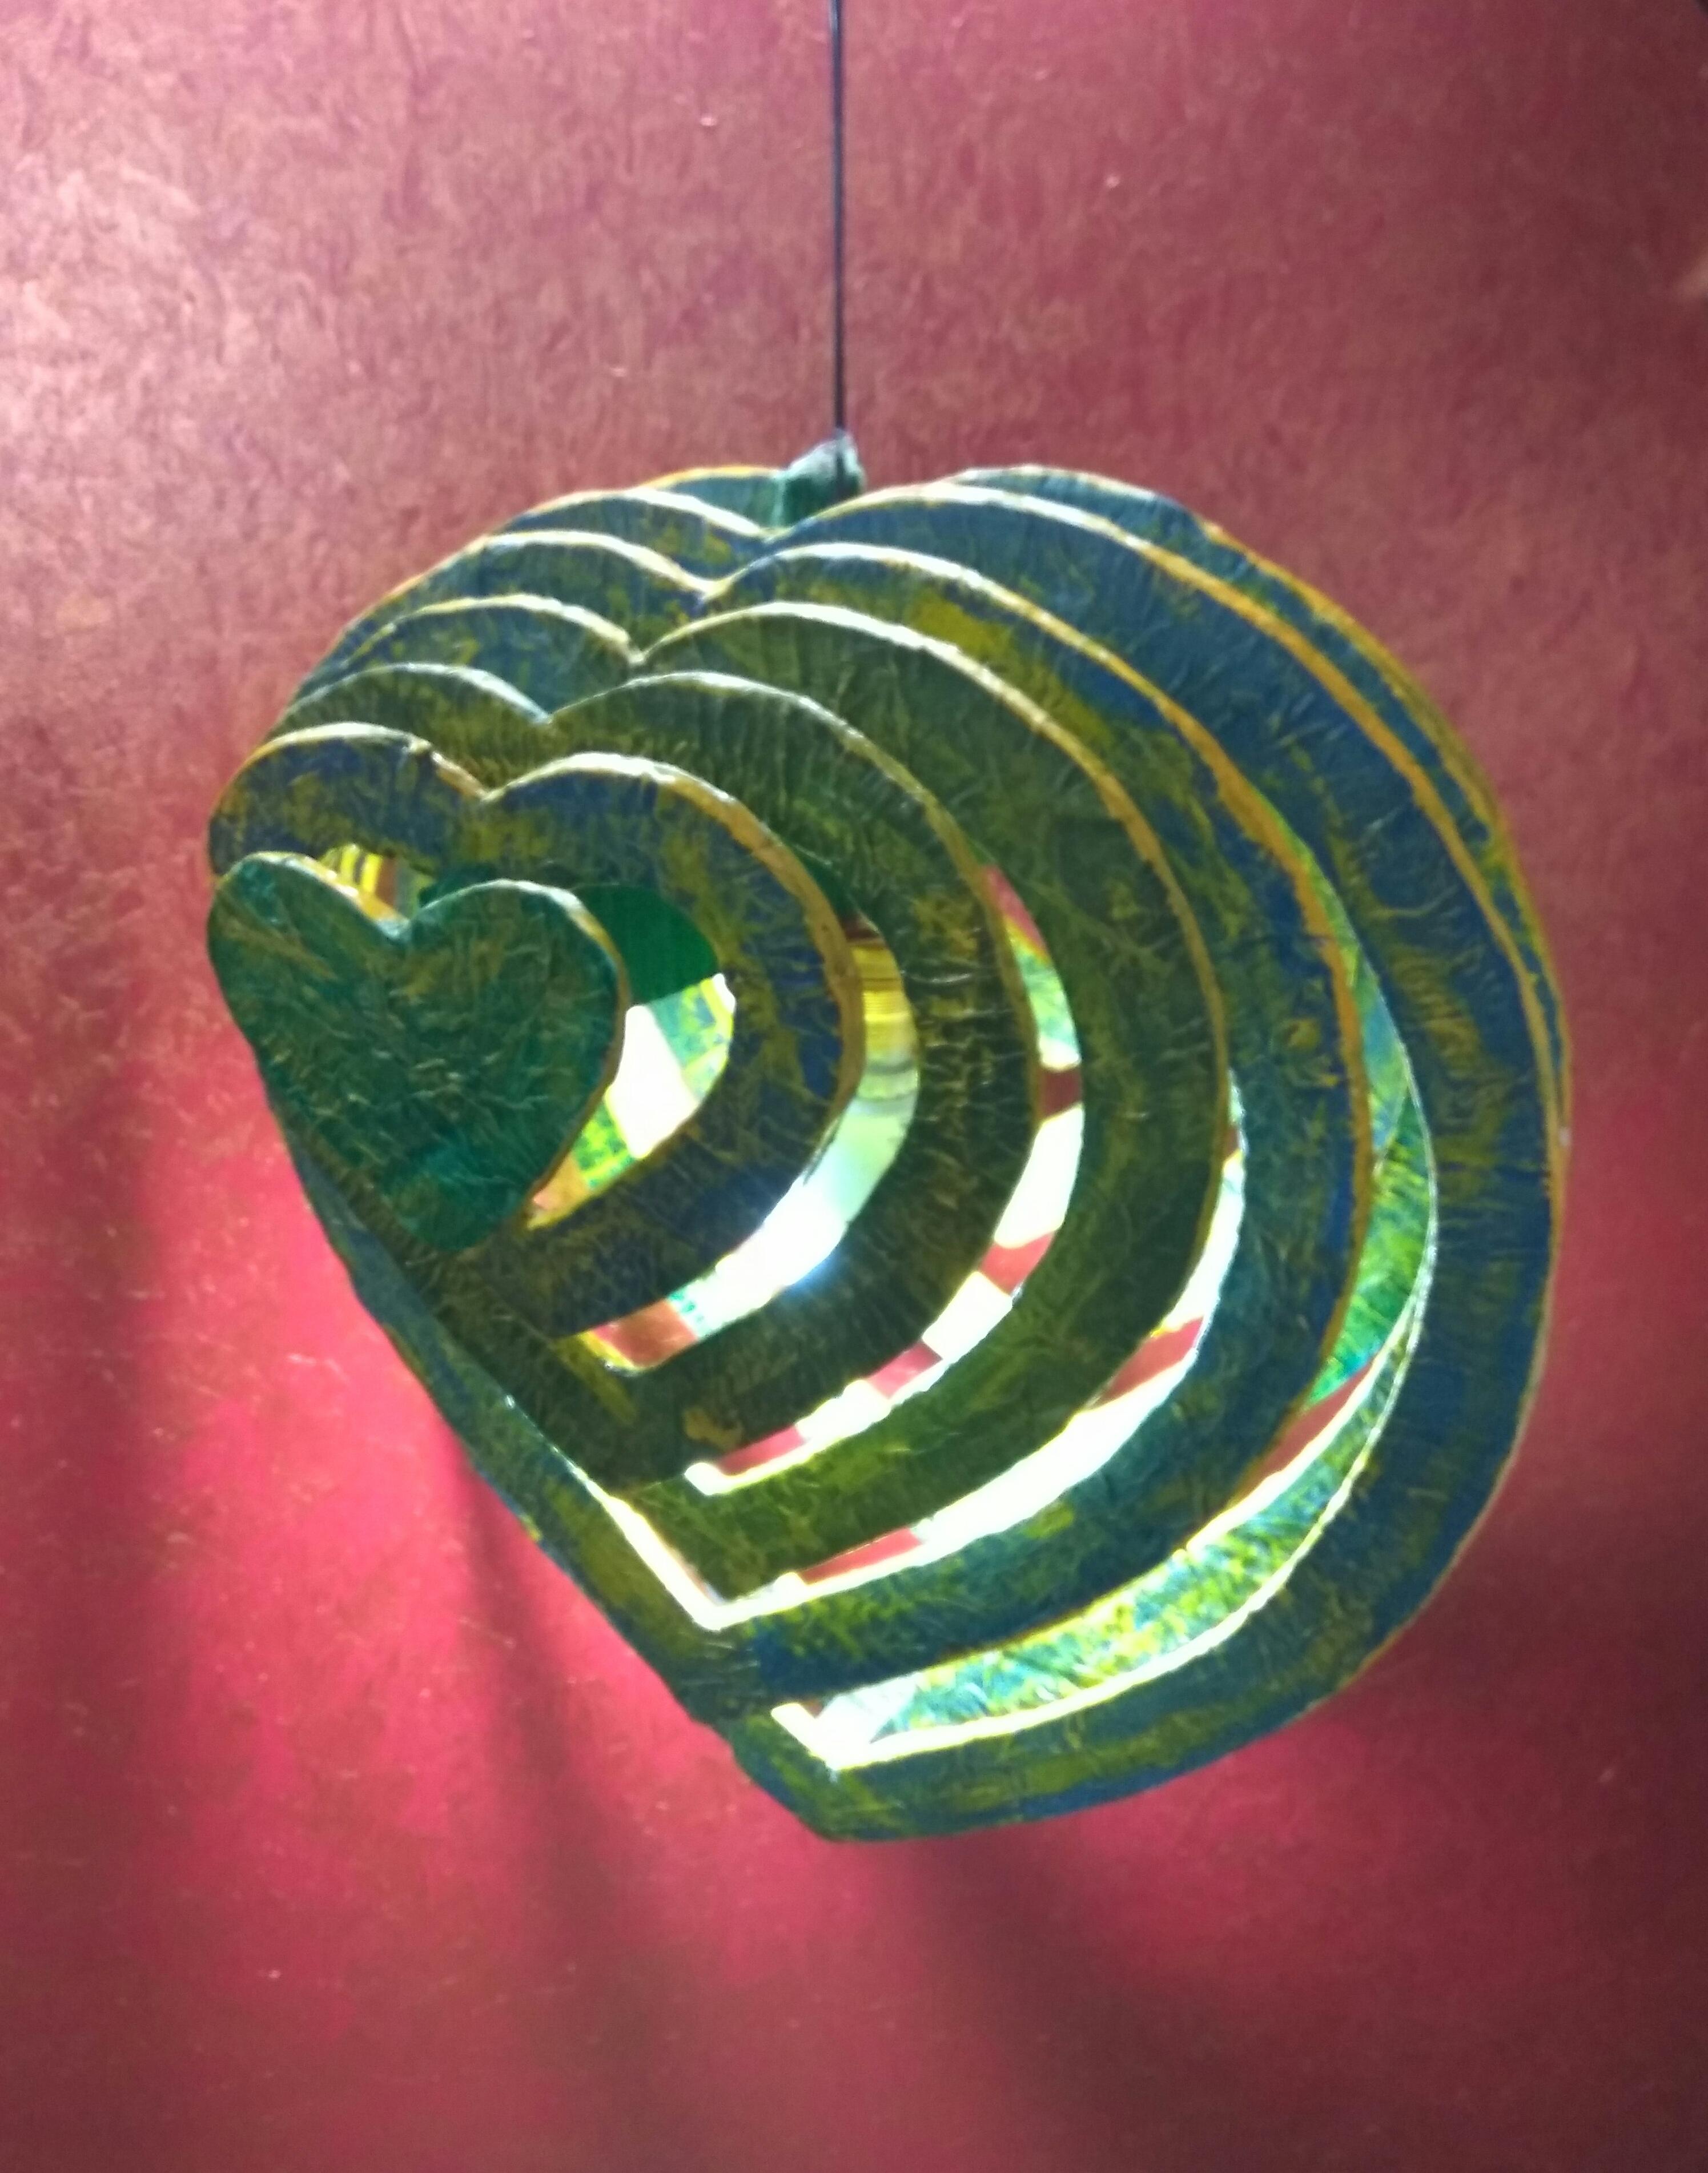 Pretty Cardboard Heart Shaped Hanging Lamp.